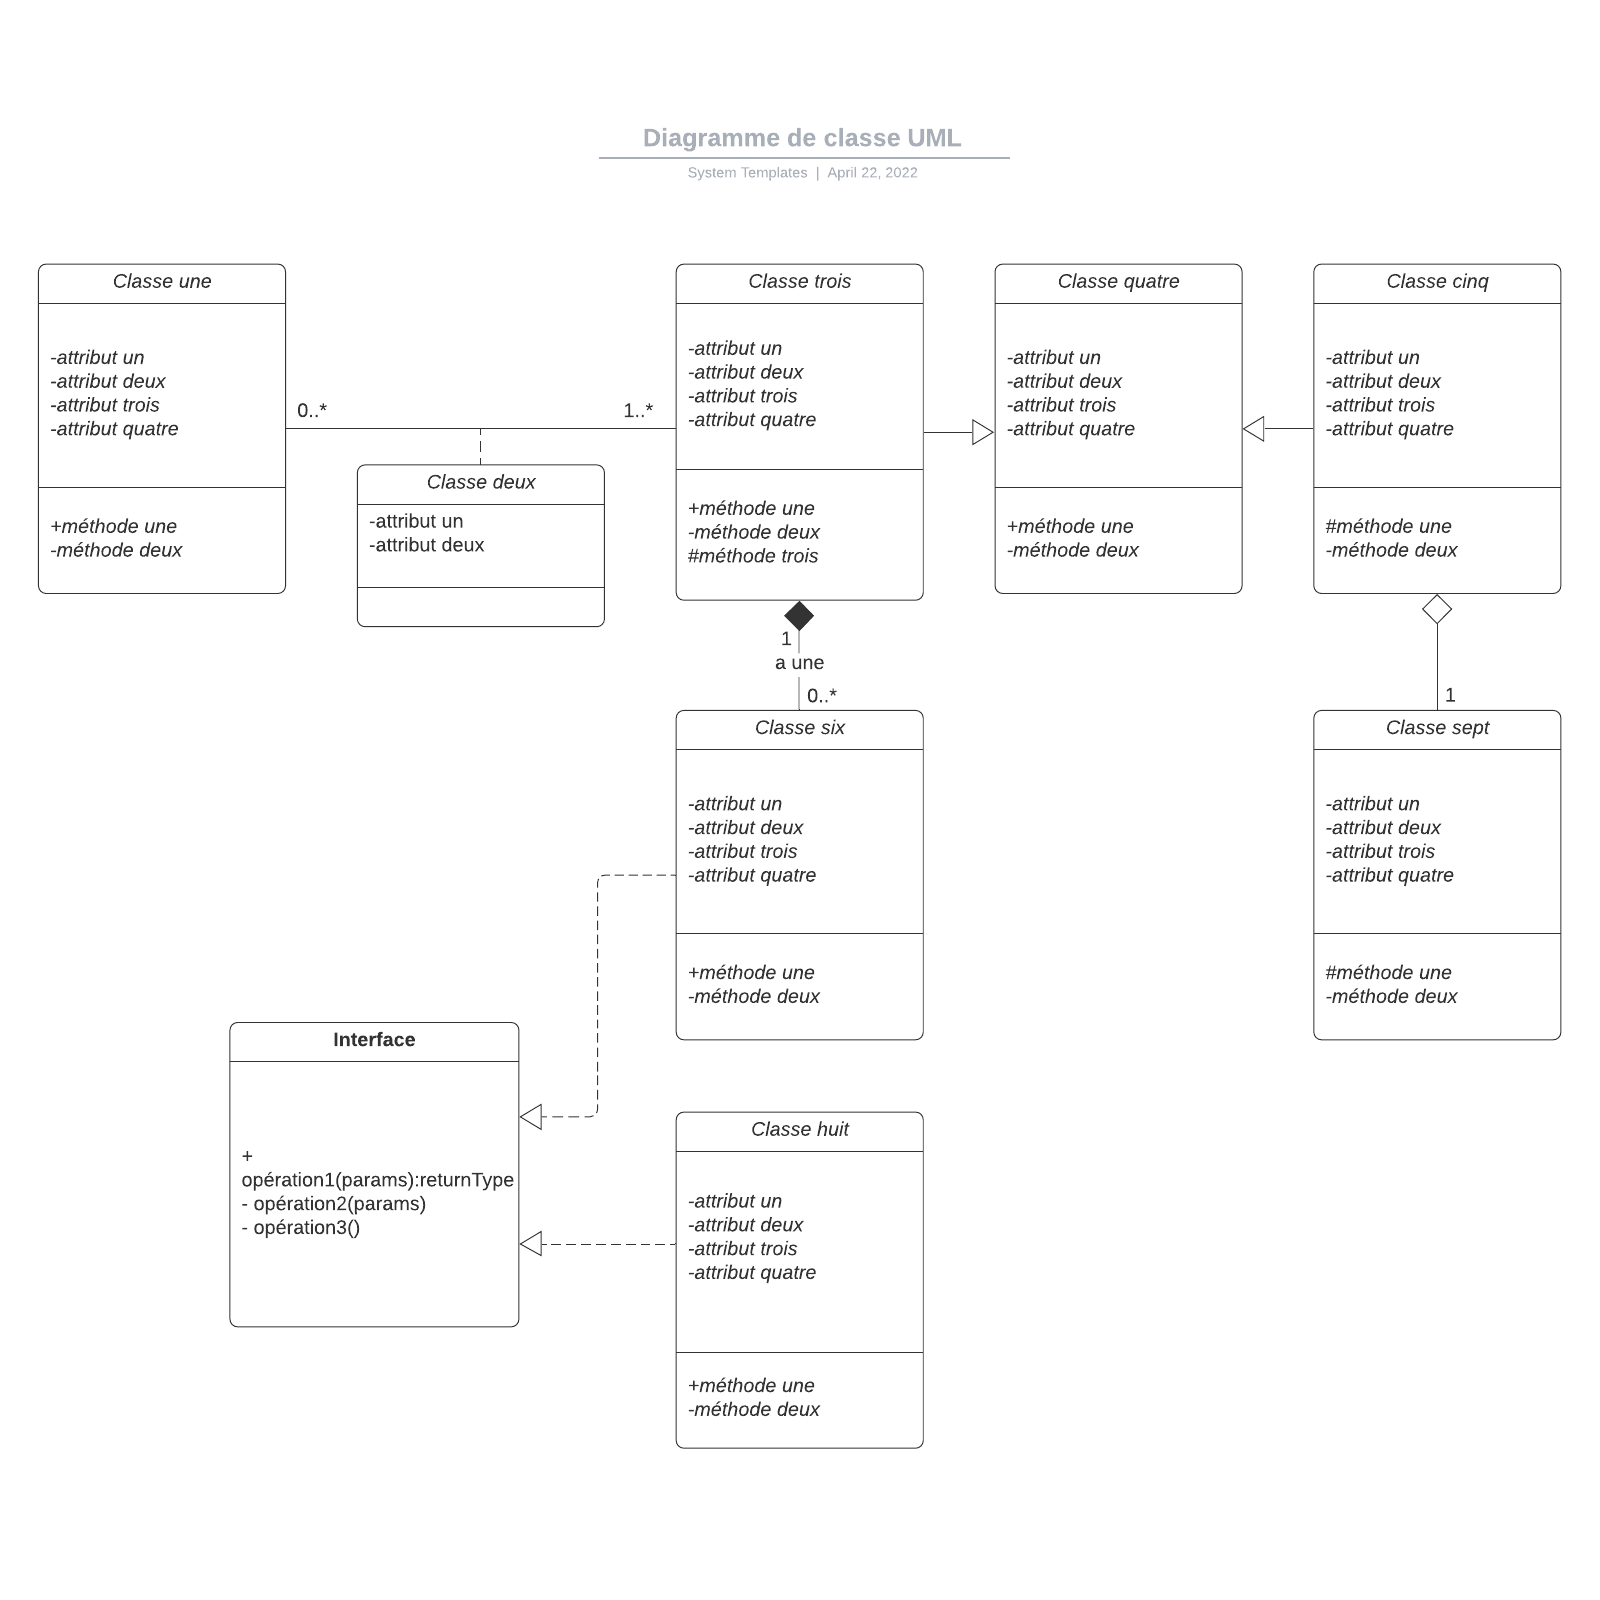 exemple de diagramme de classe UML vierge